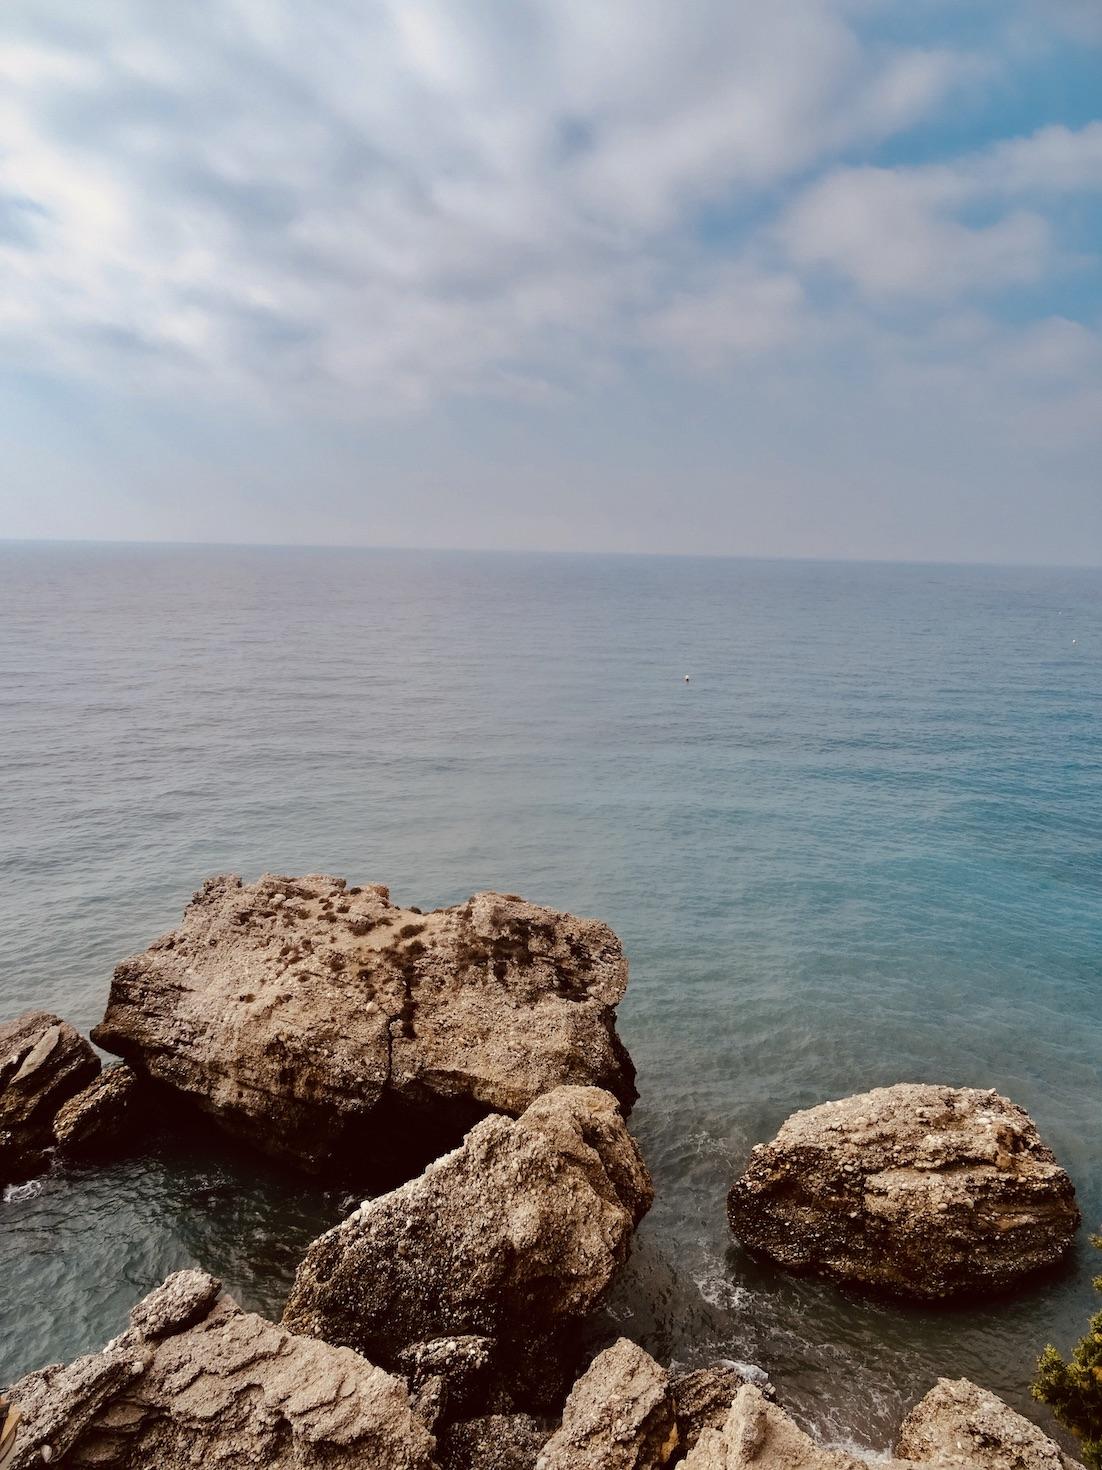 The Alboran Sea Nerja Spain.